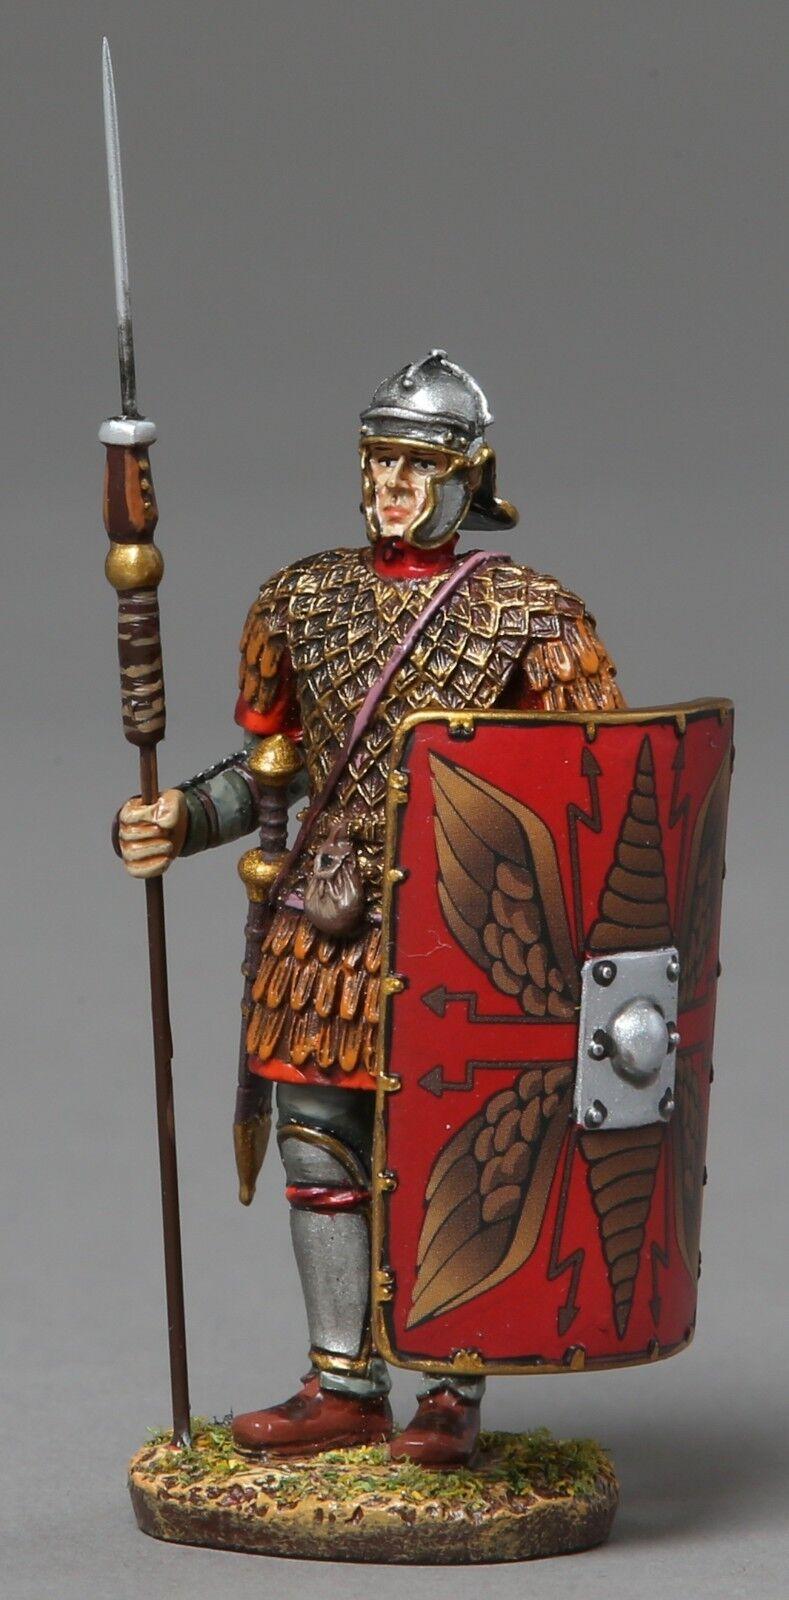 THOMAS GUNN ROMAN EMPIRE ROM091A IMPERIAL ROMAN SENTRY MIB